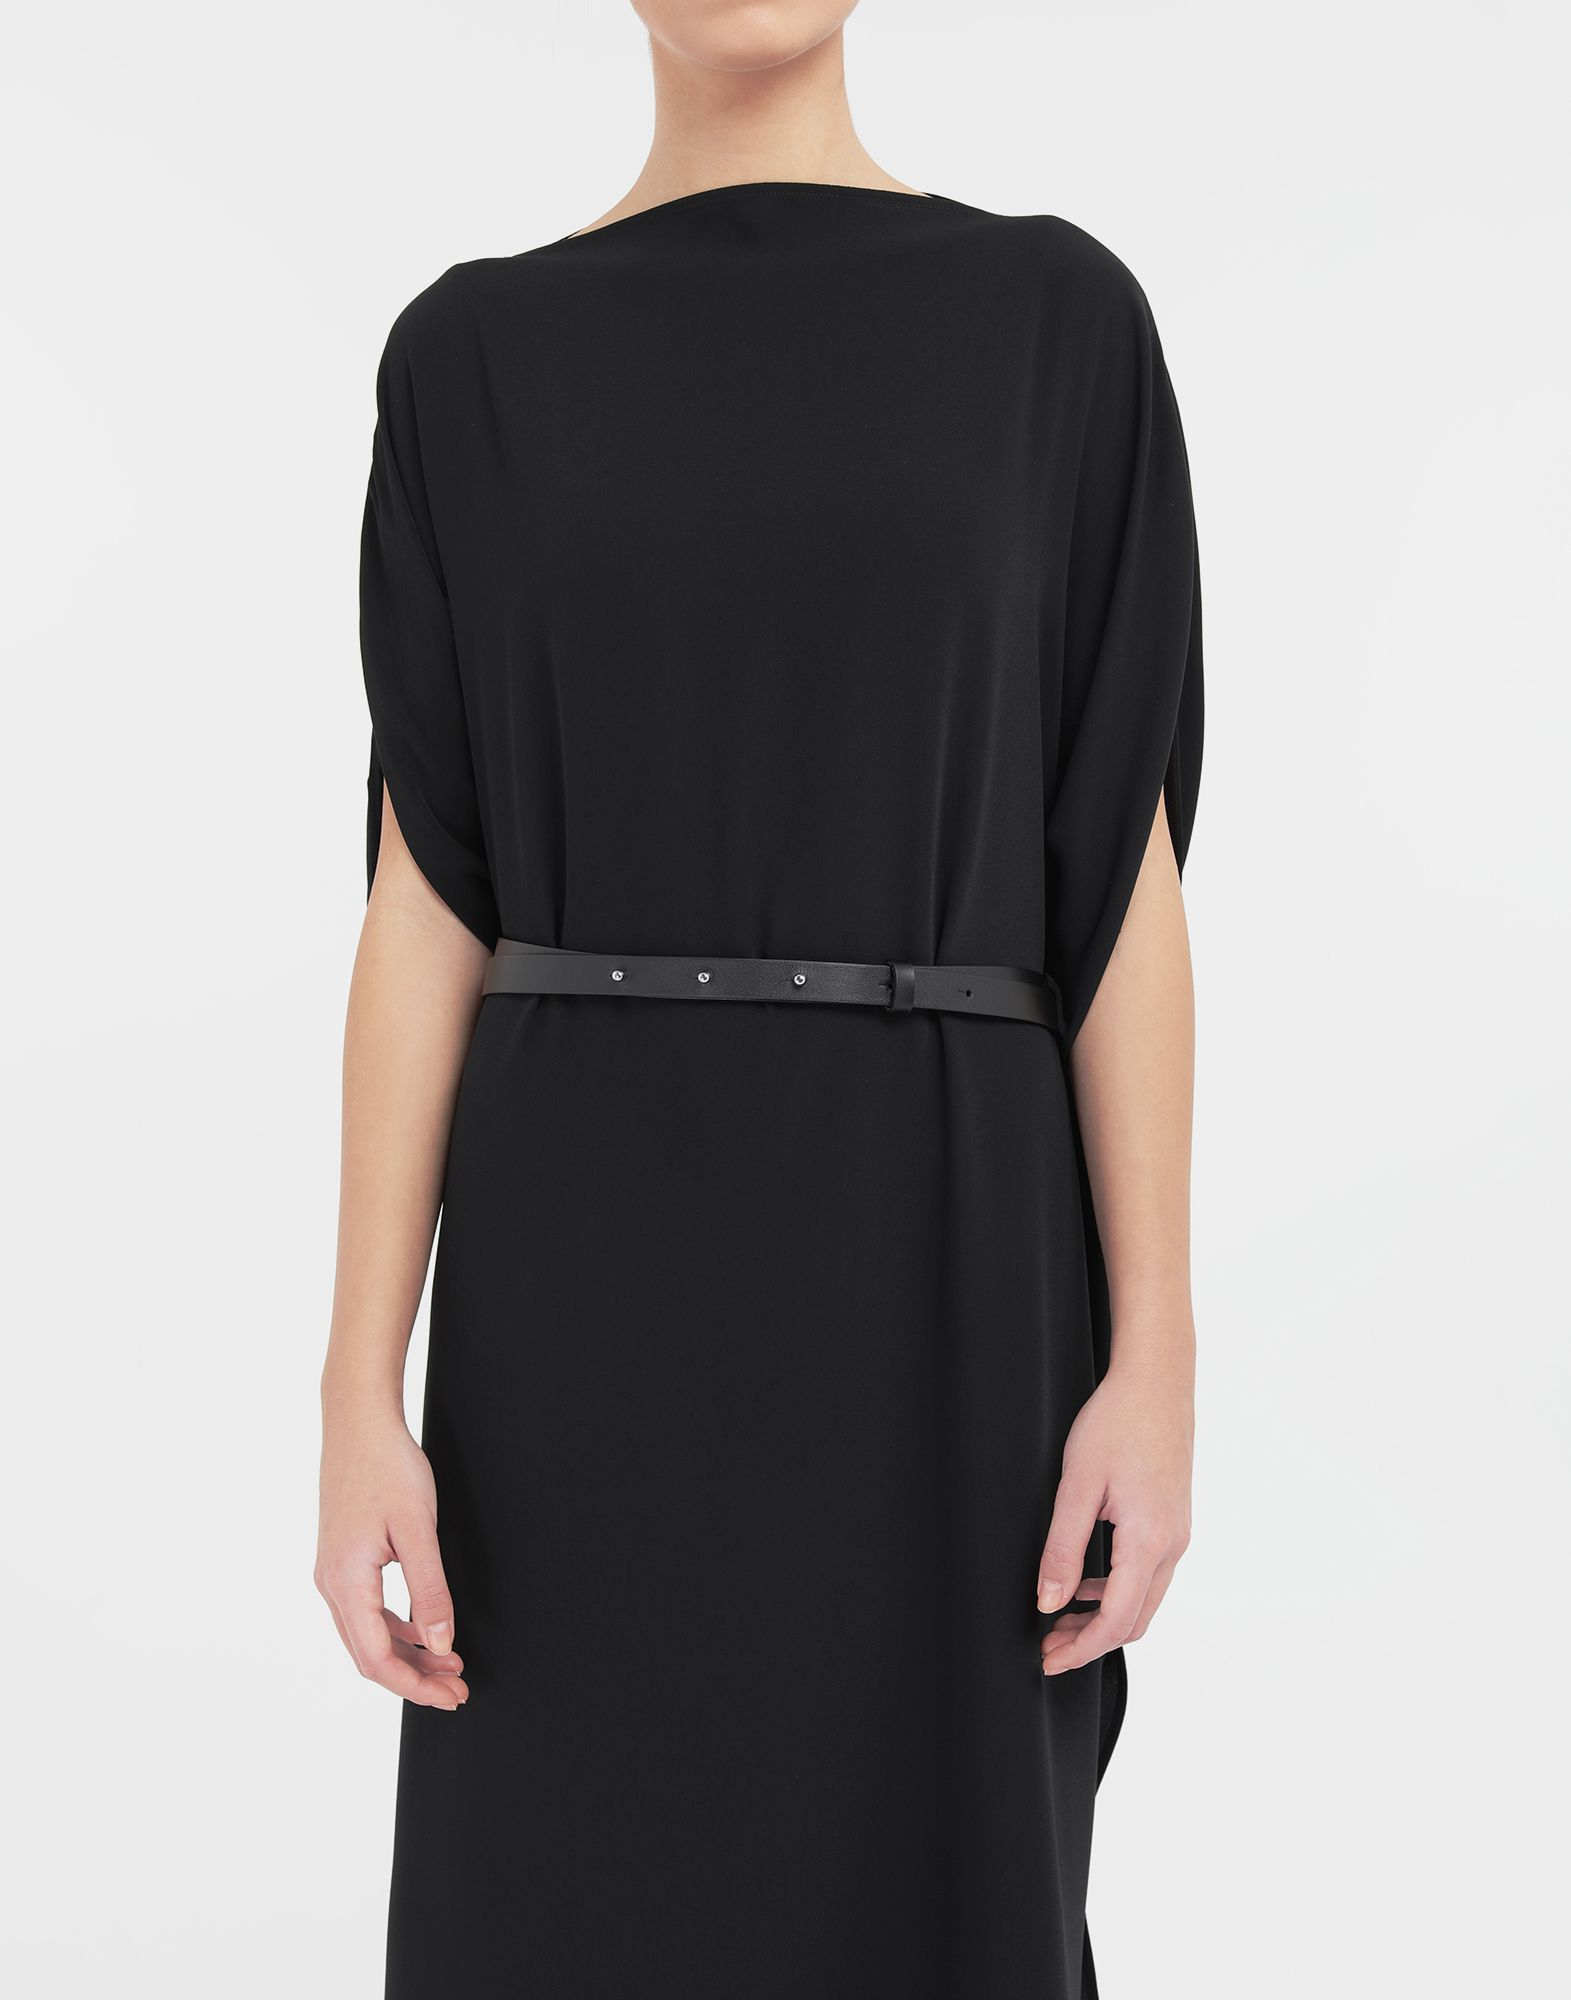 MM6 MAISON MARGIELA Circle belted dress 3/4 length dress Woman a